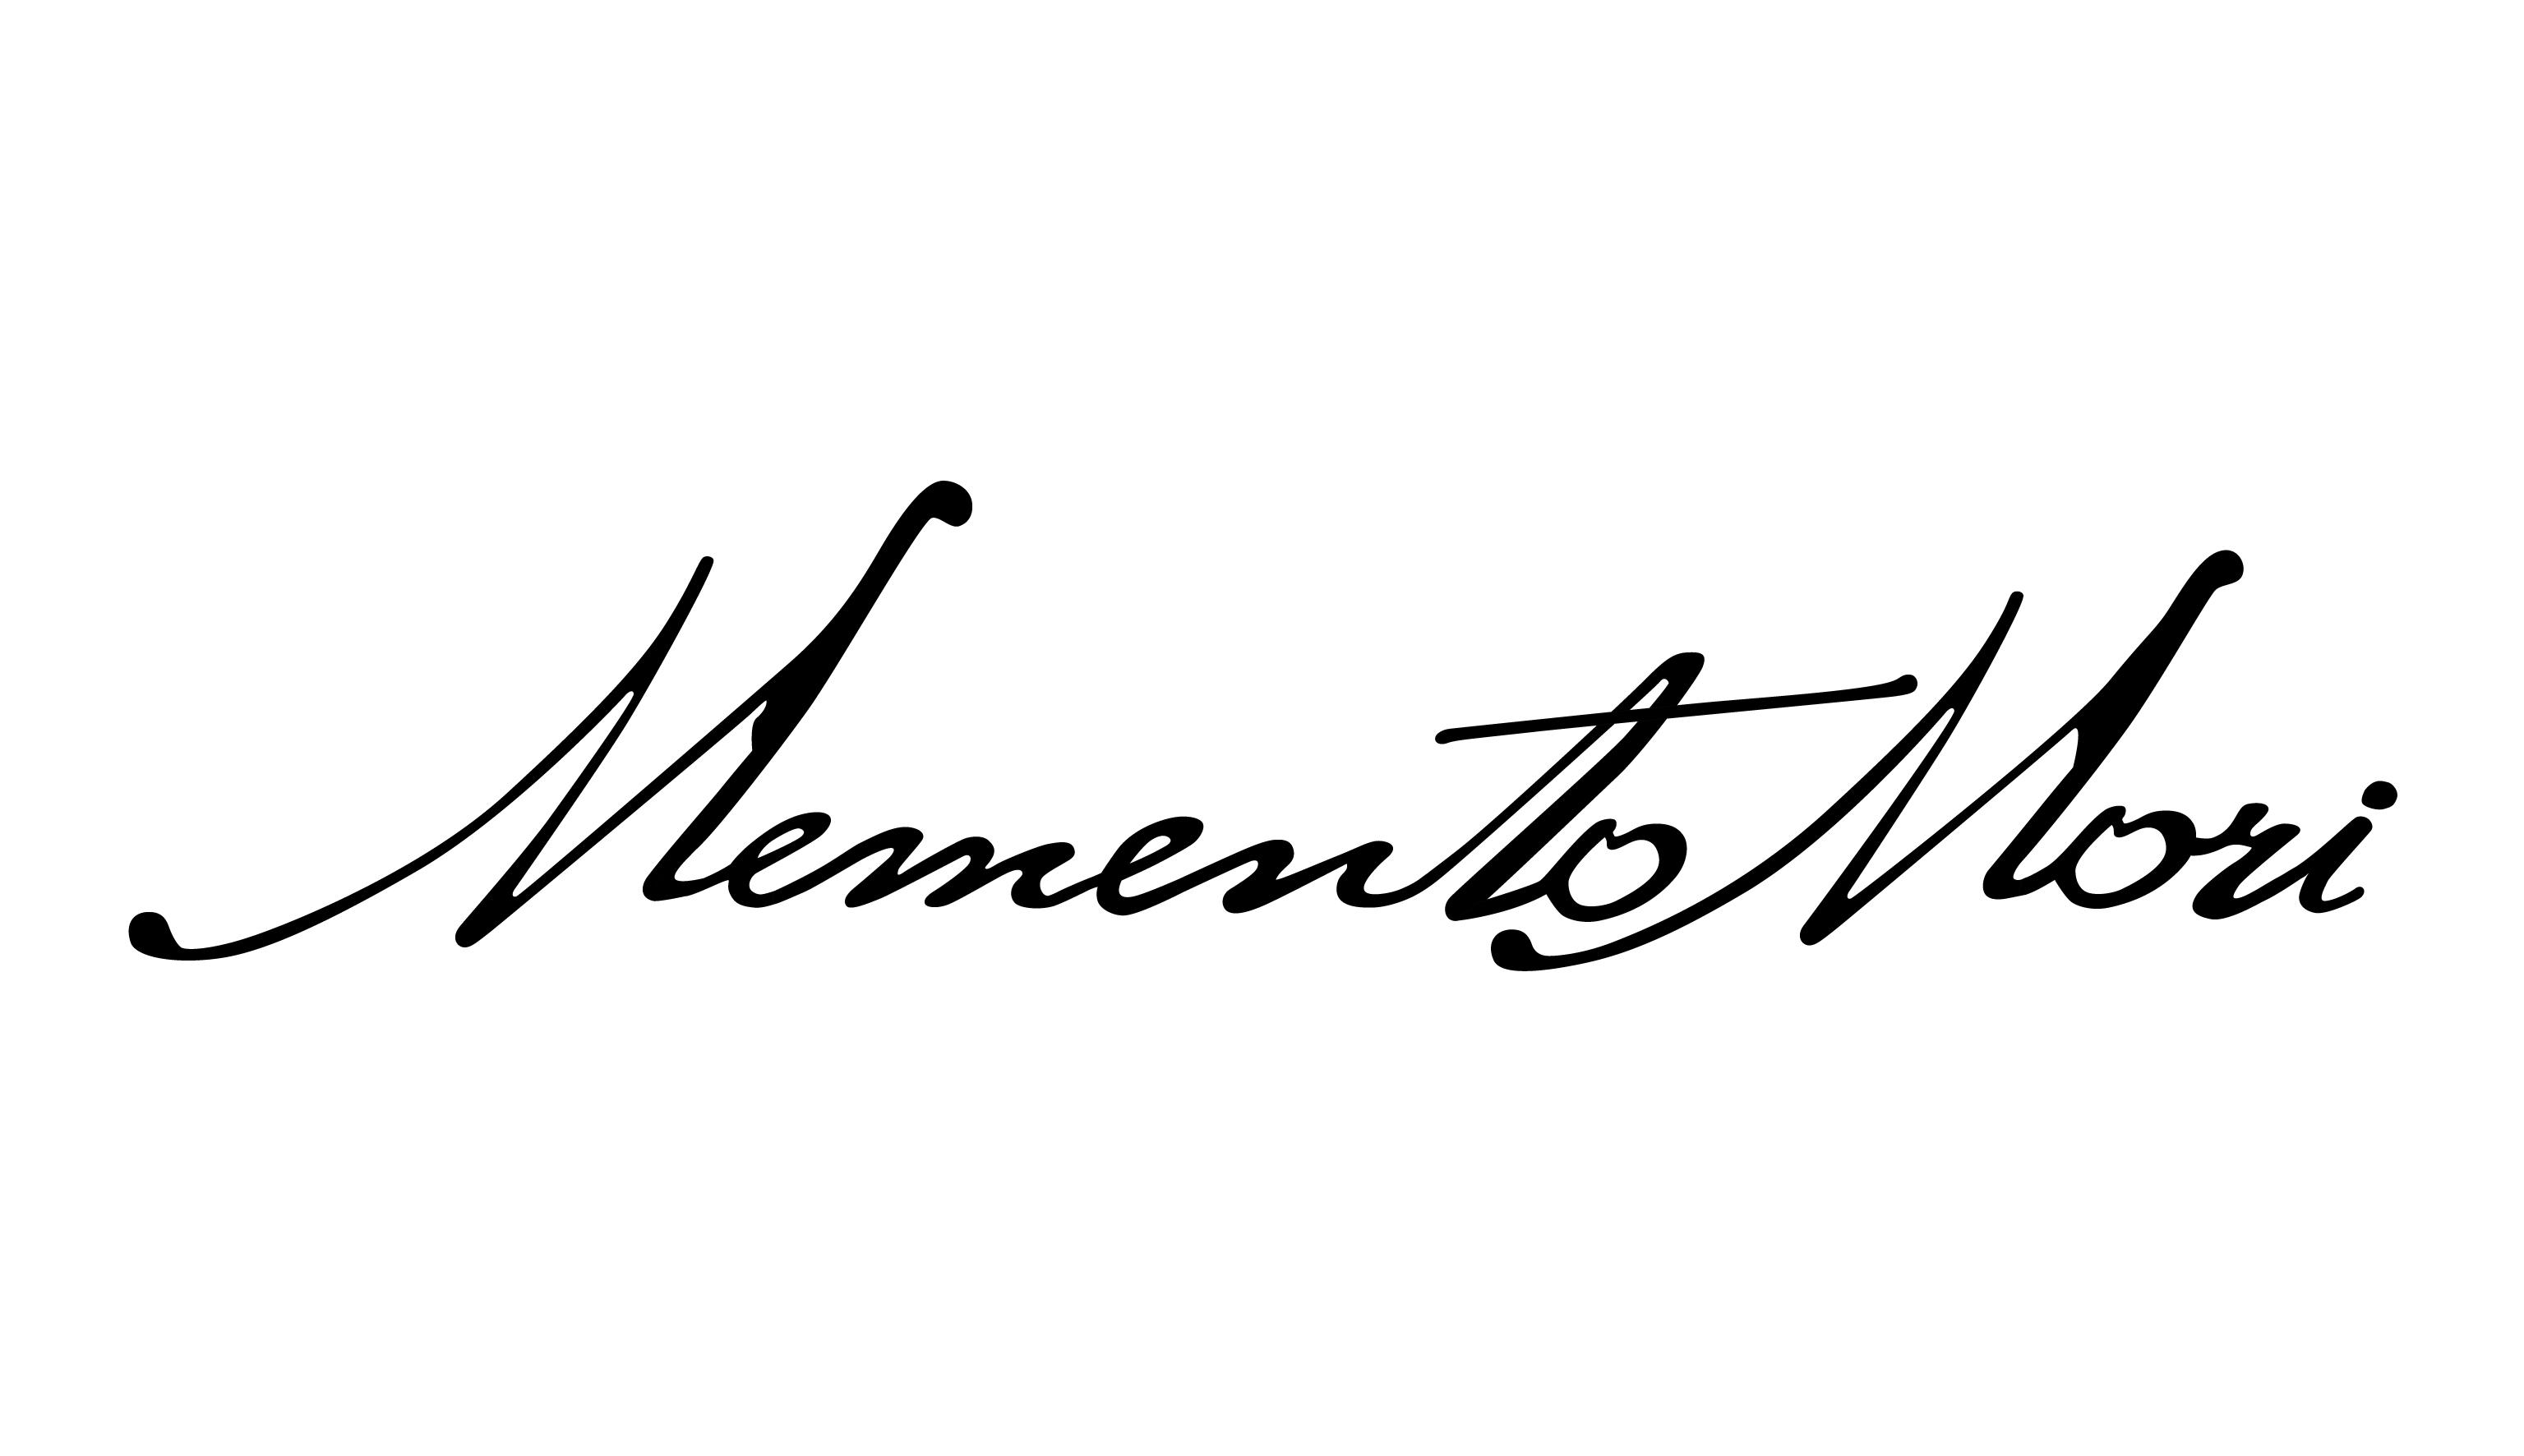 memento mori design as pdf file by blackboxberlin on deviantart. Black Bedroom Furniture Sets. Home Design Ideas